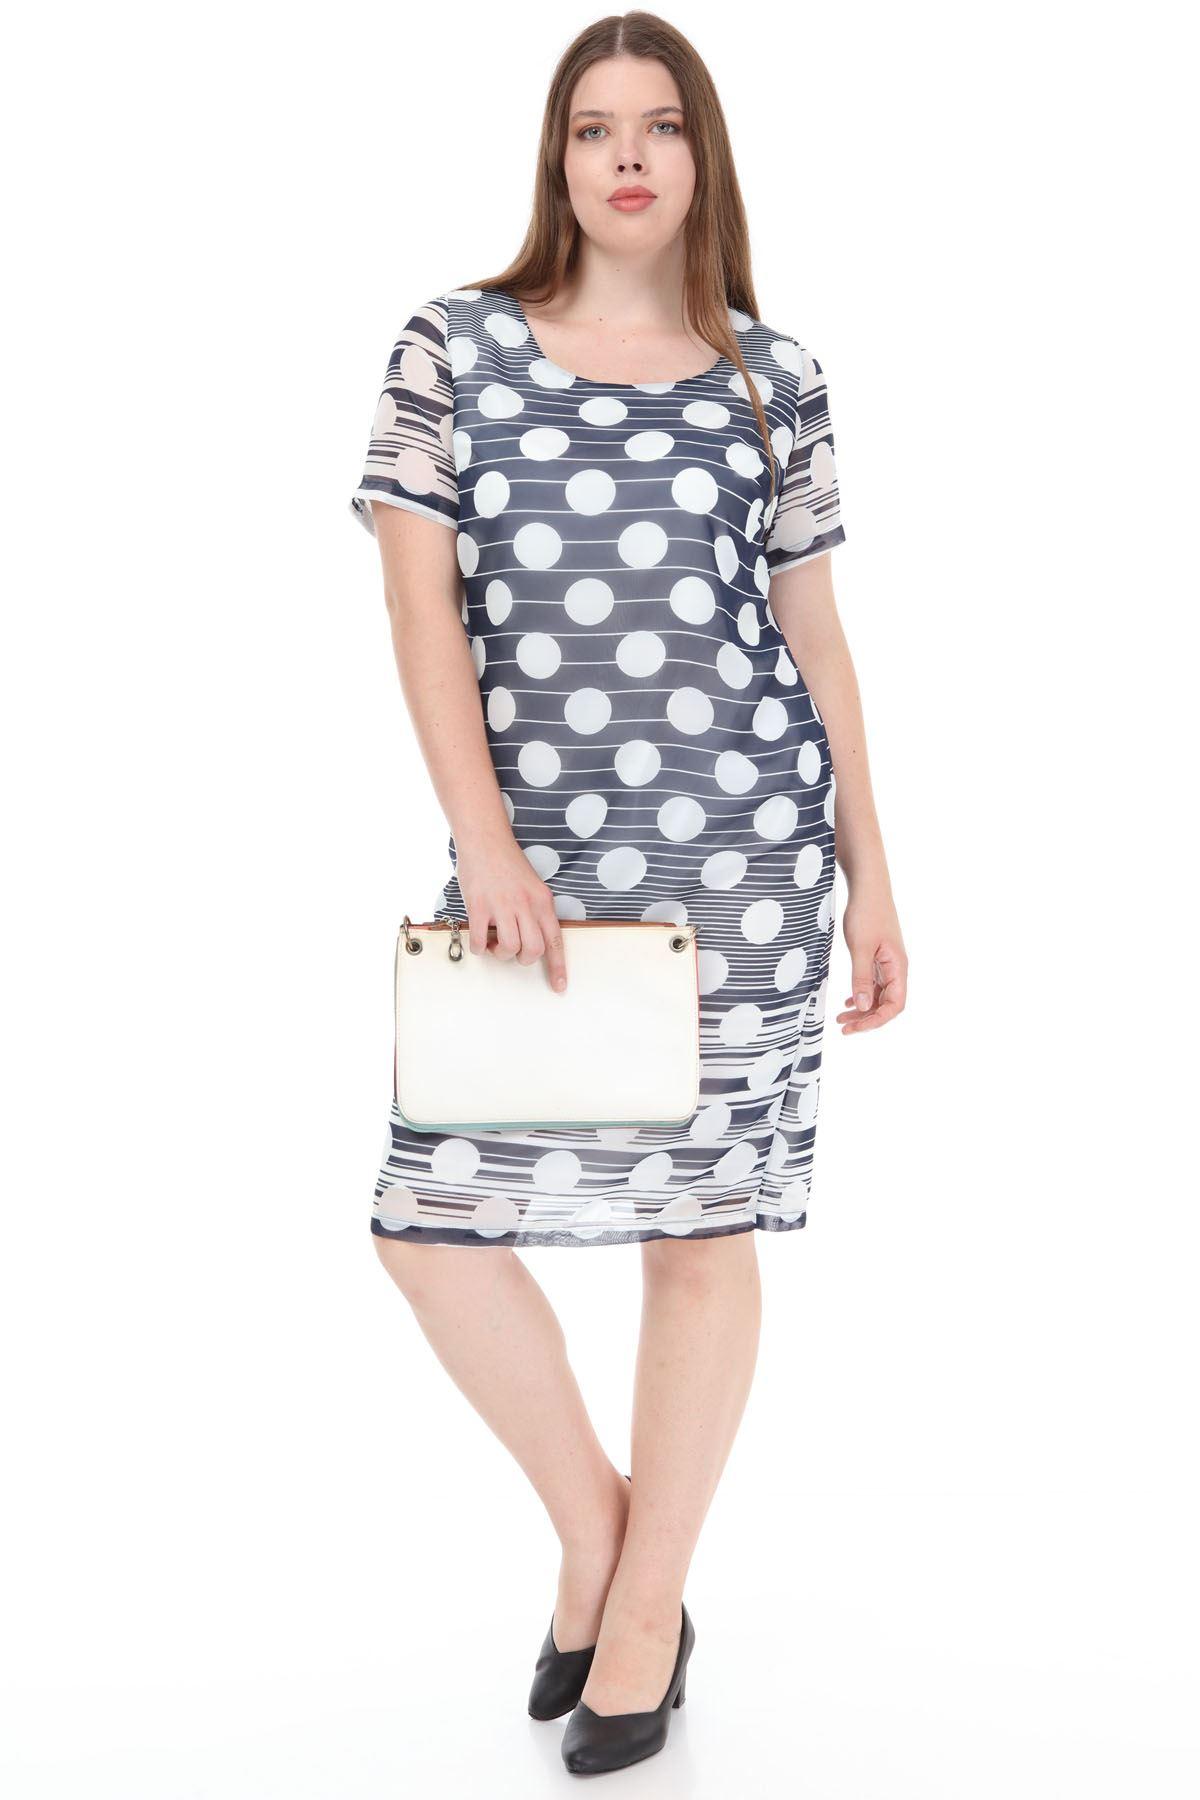 Lacivert Puanlı Şifon Elbise F2-1126